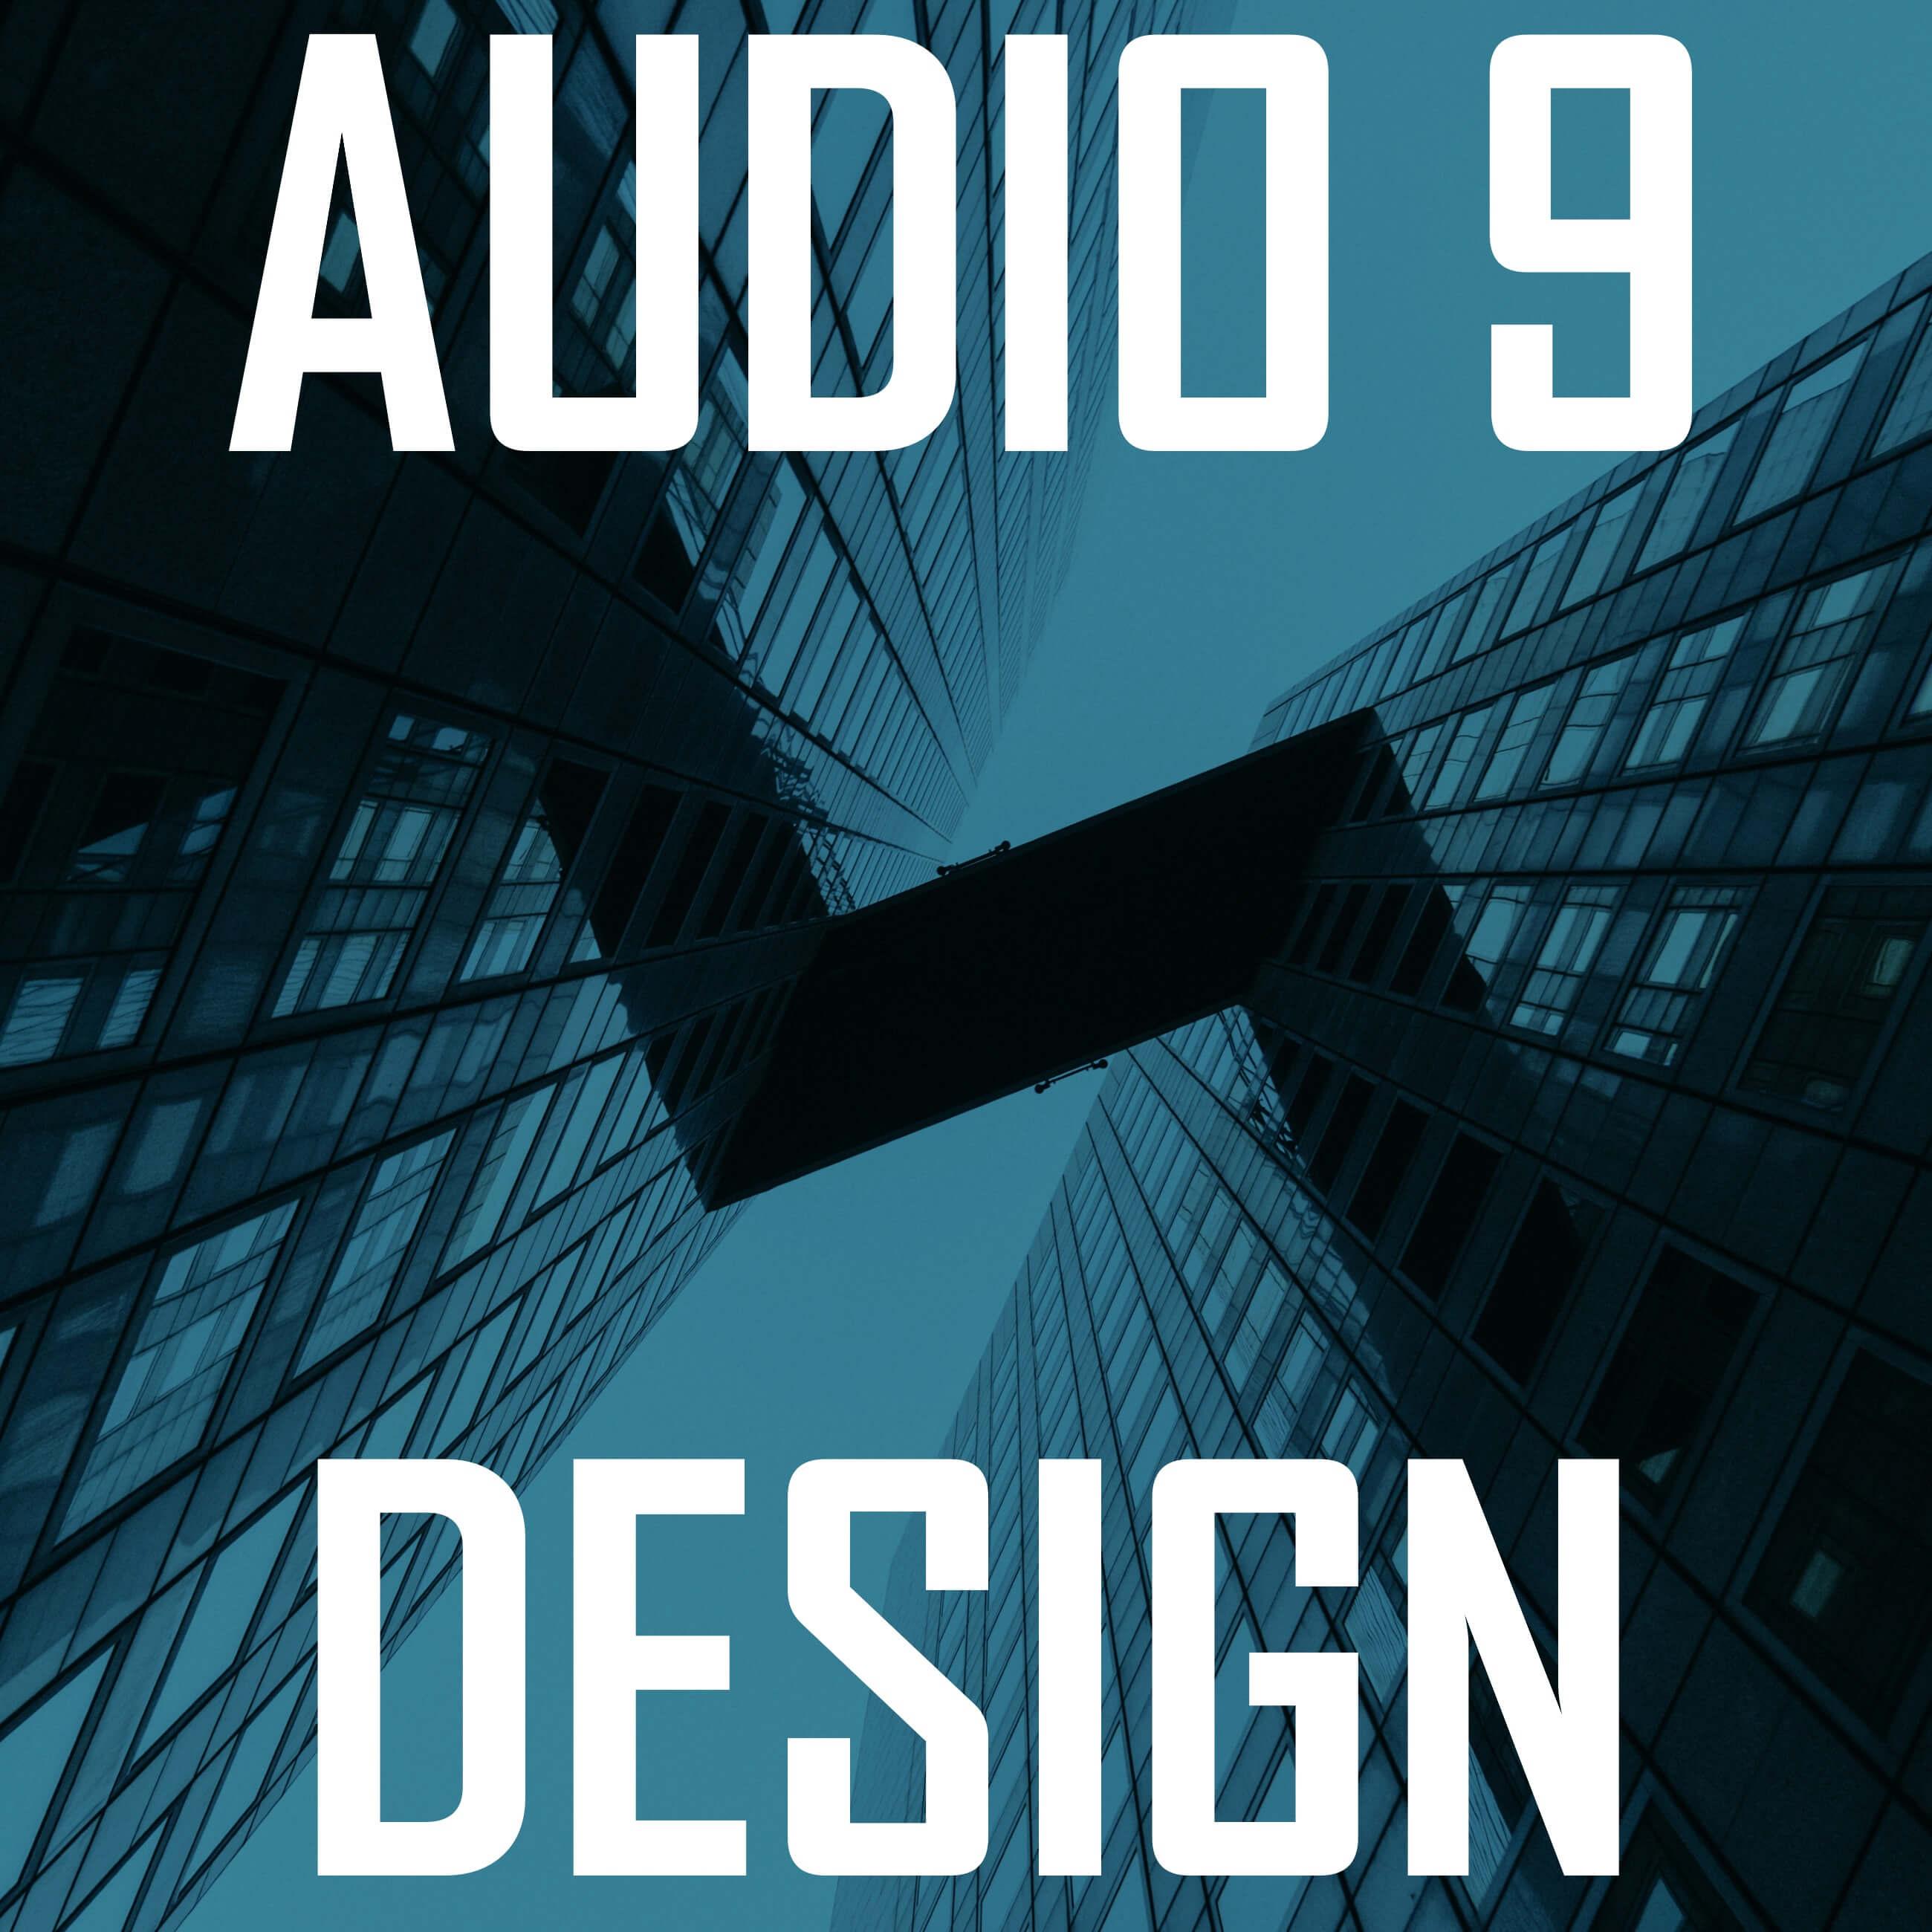 Jason Talks Design - Episode 20 - Color Theory in Design